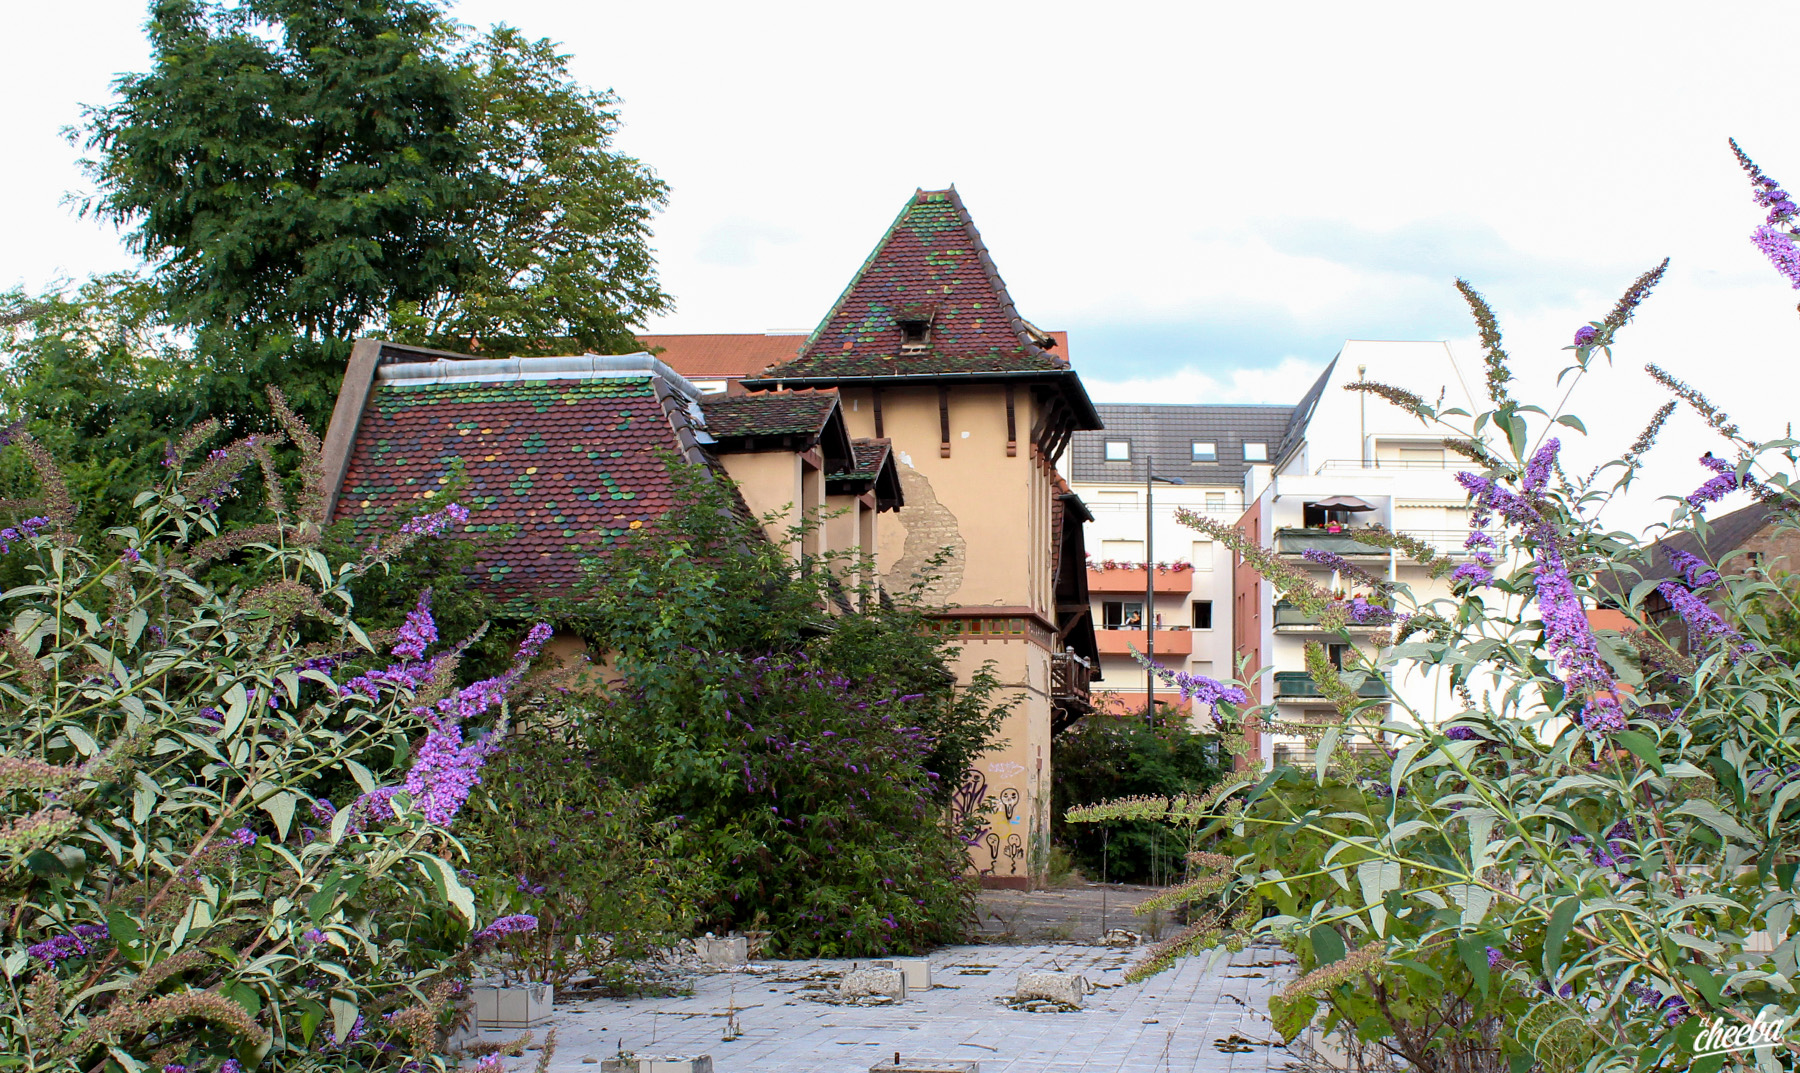 Urbex à la Brasserie Fischer de Schiltigheim (2016) - Urbex Alsace